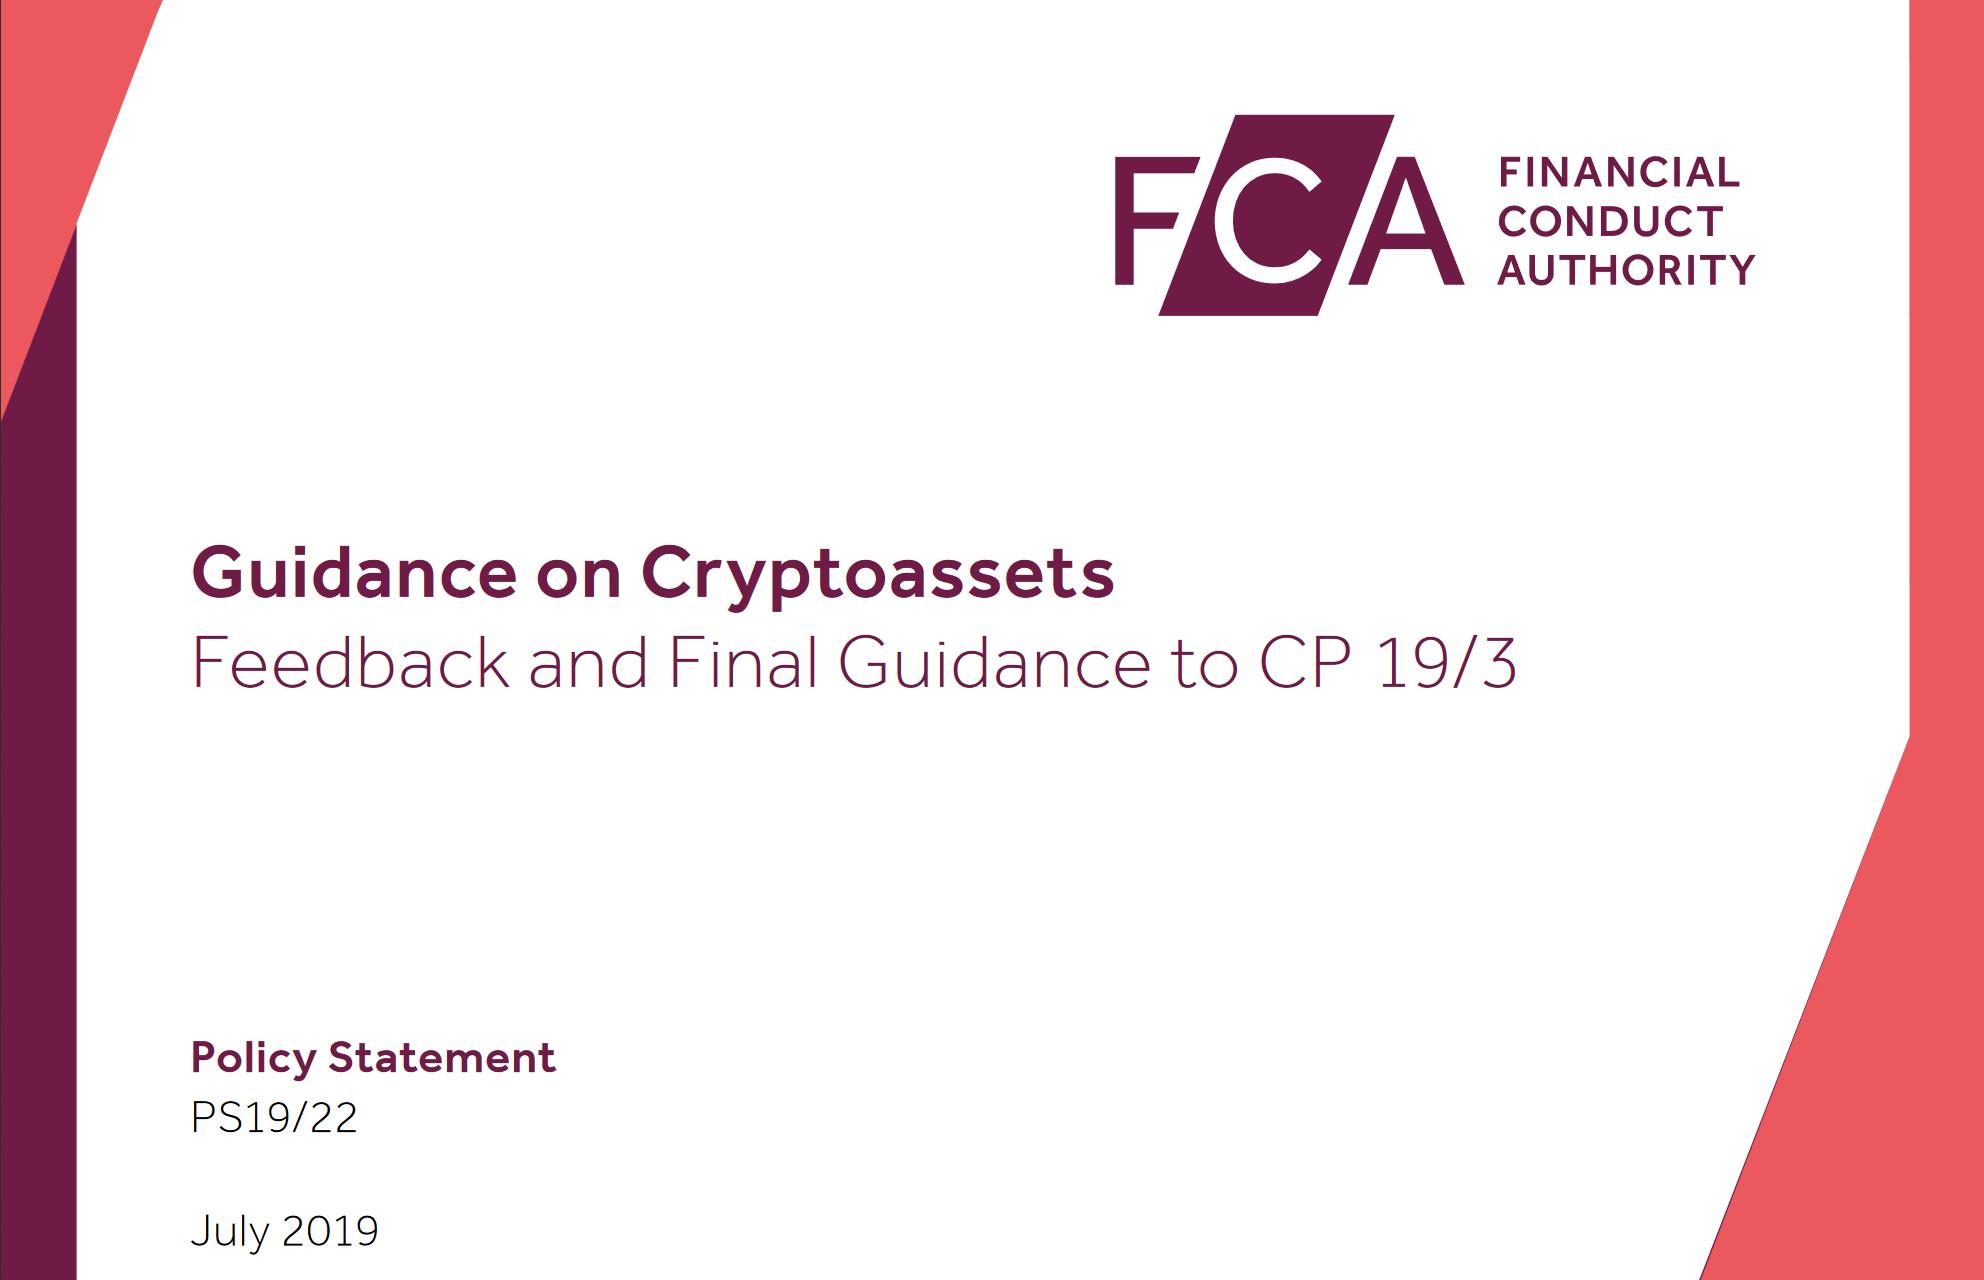 FCA Crypto Guidance